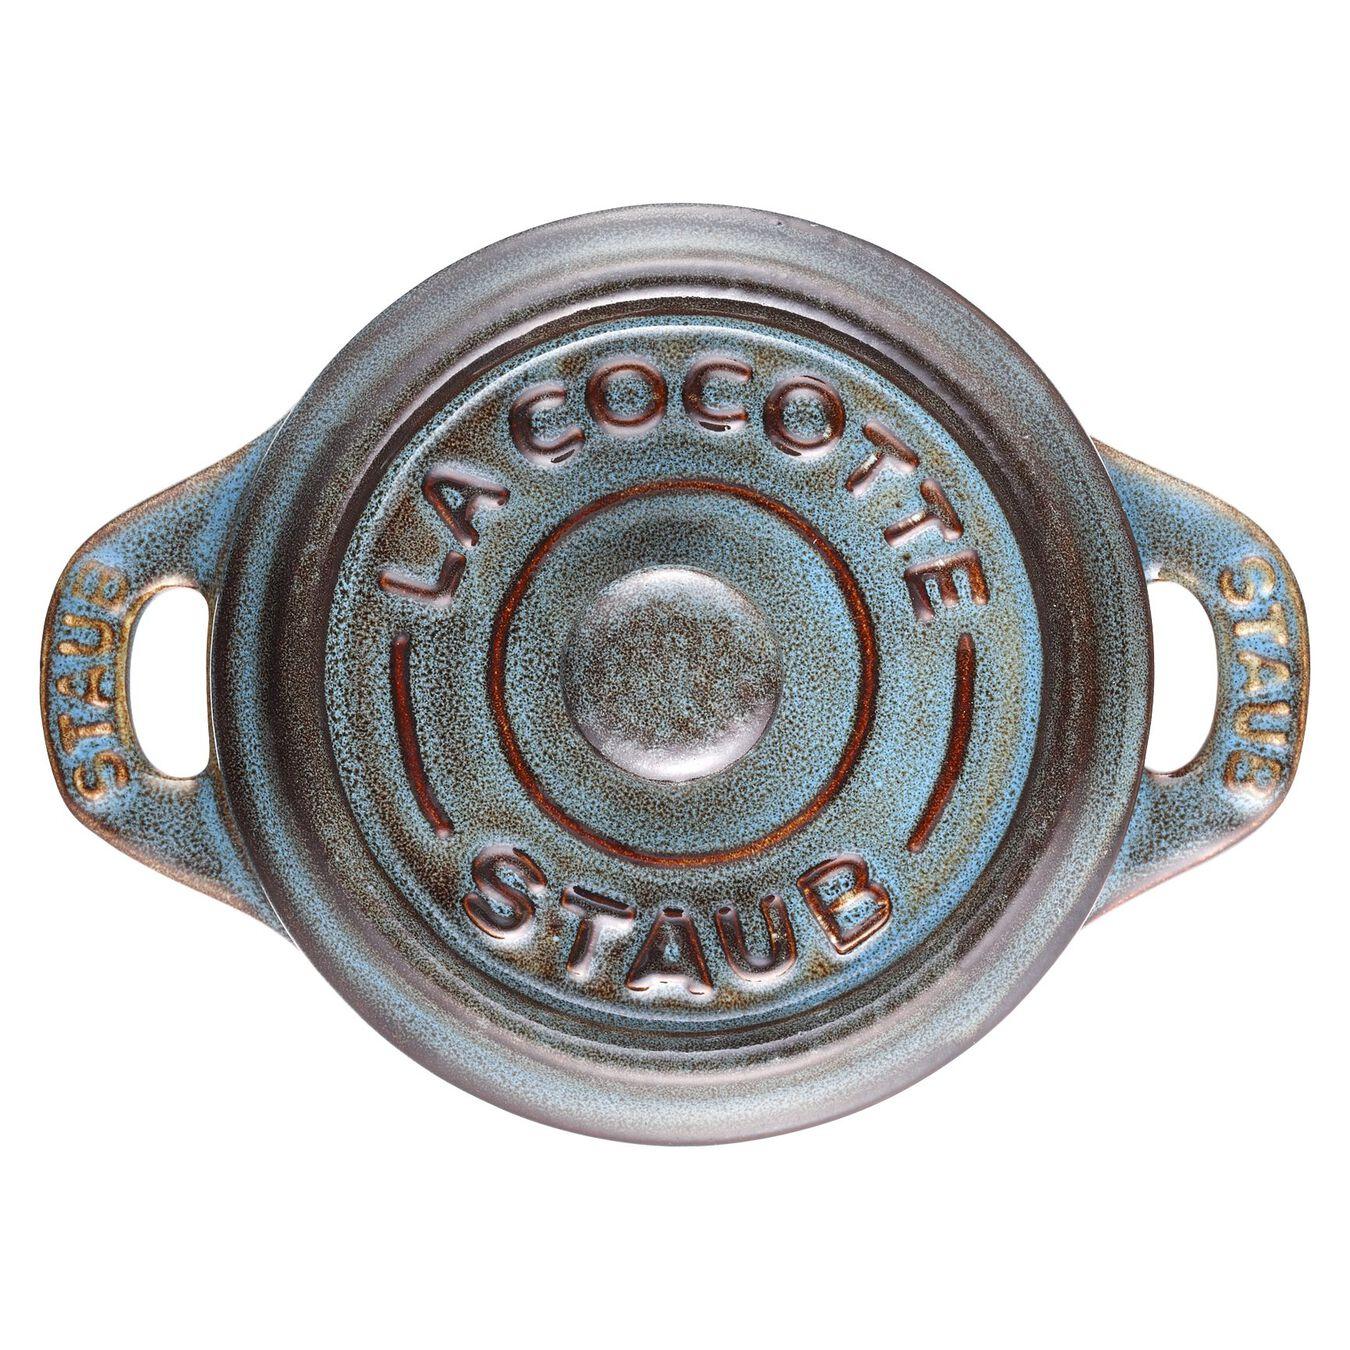 Mini cocotte rotonda - 10 cm, turchese antico,,large 3